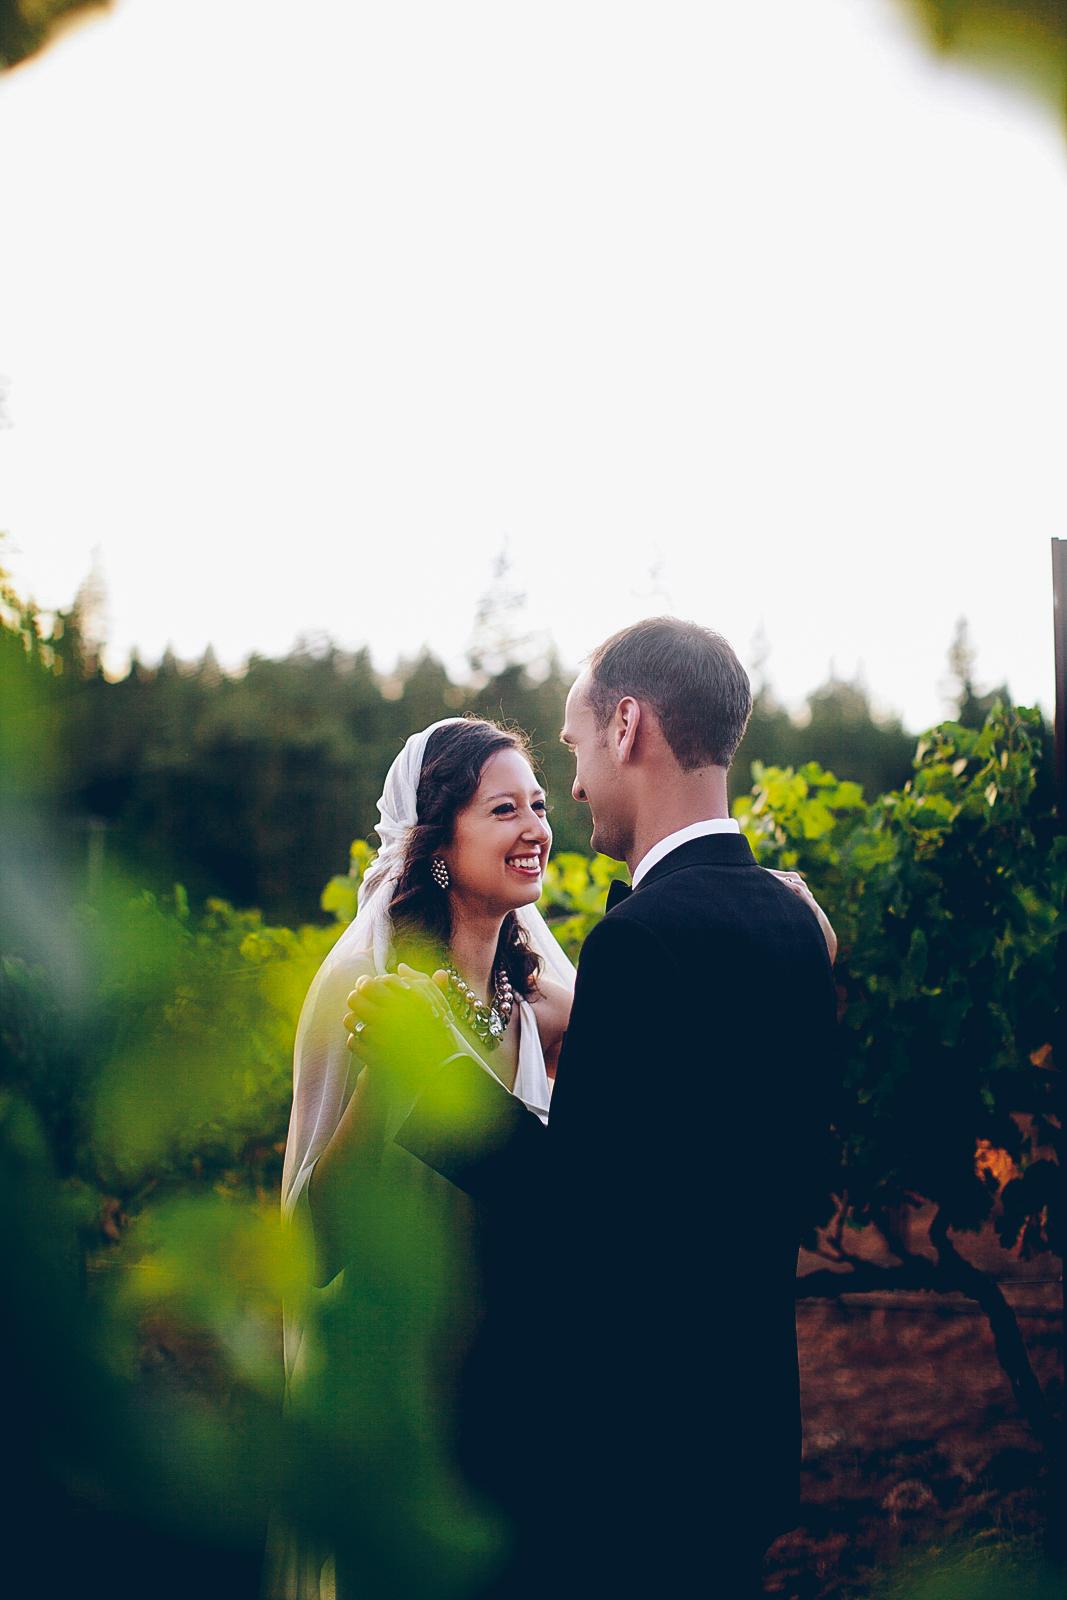 miraflores_winery_wedding_photography_ian_melissa_ebony_siovhan_bokeh_photography_57.jpg